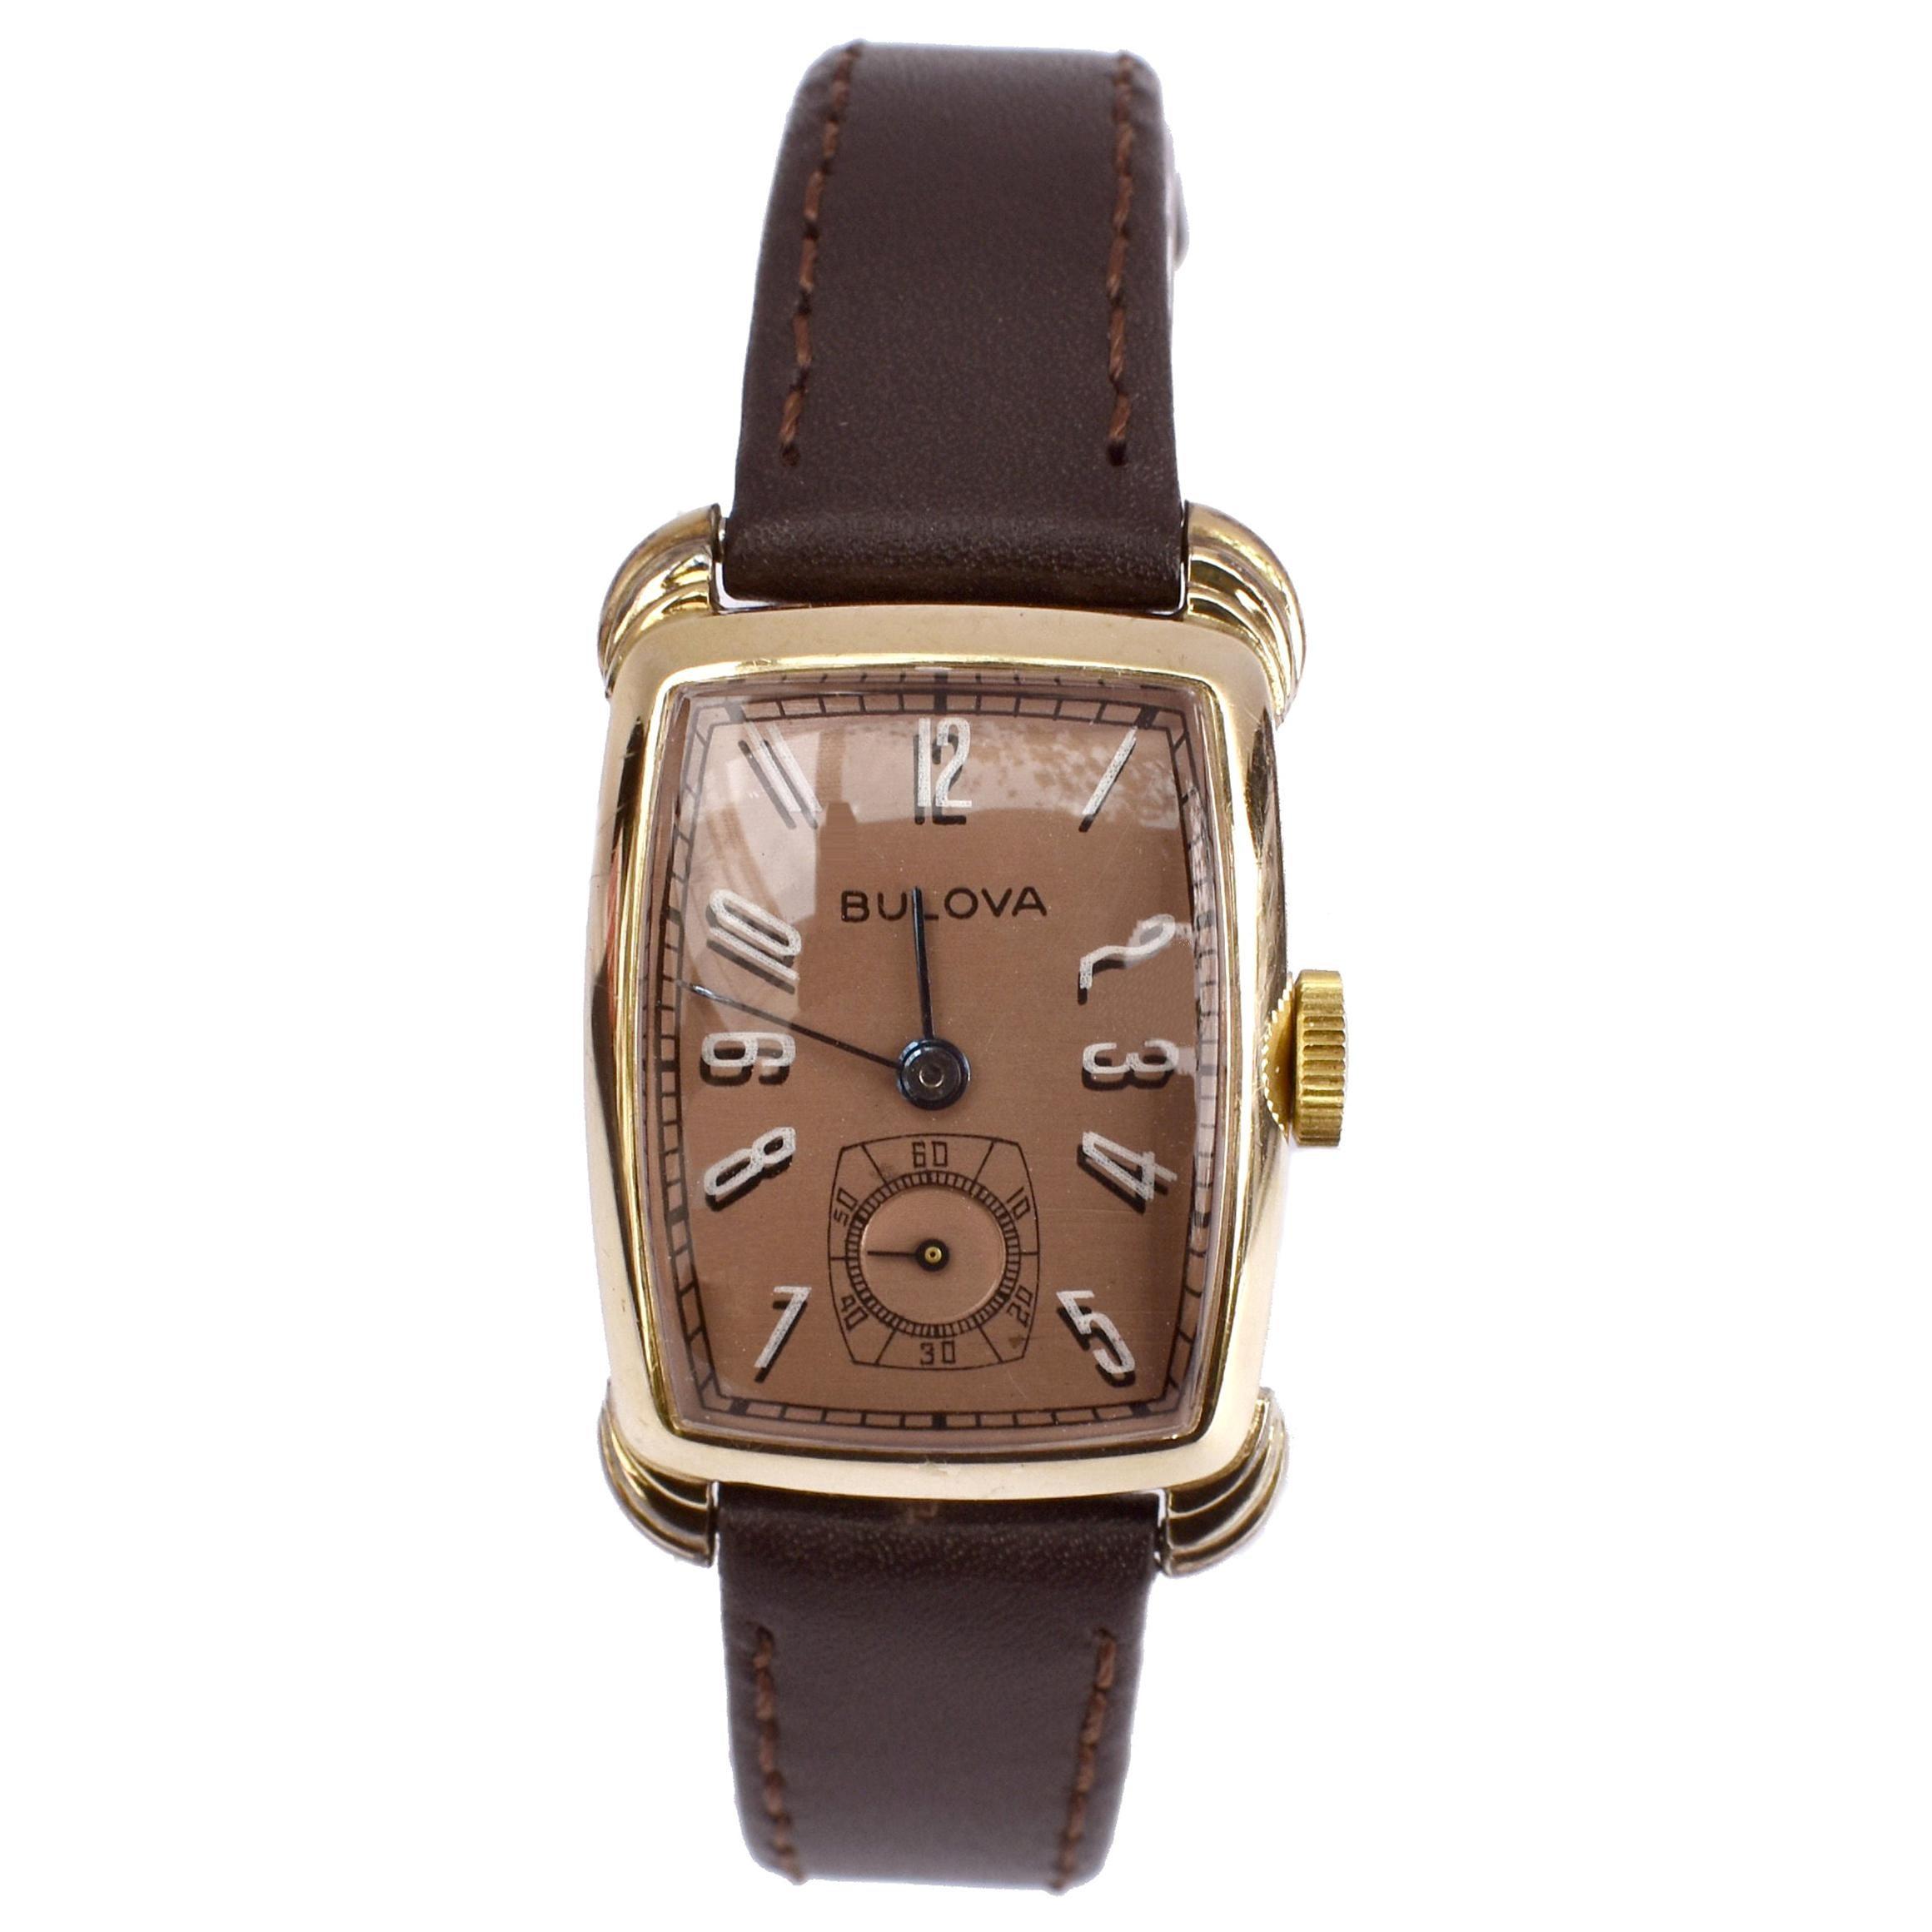 Art Deco Gents Bulova Senator Watch, 14k Yellow Gold, Newly Serviced, c1942